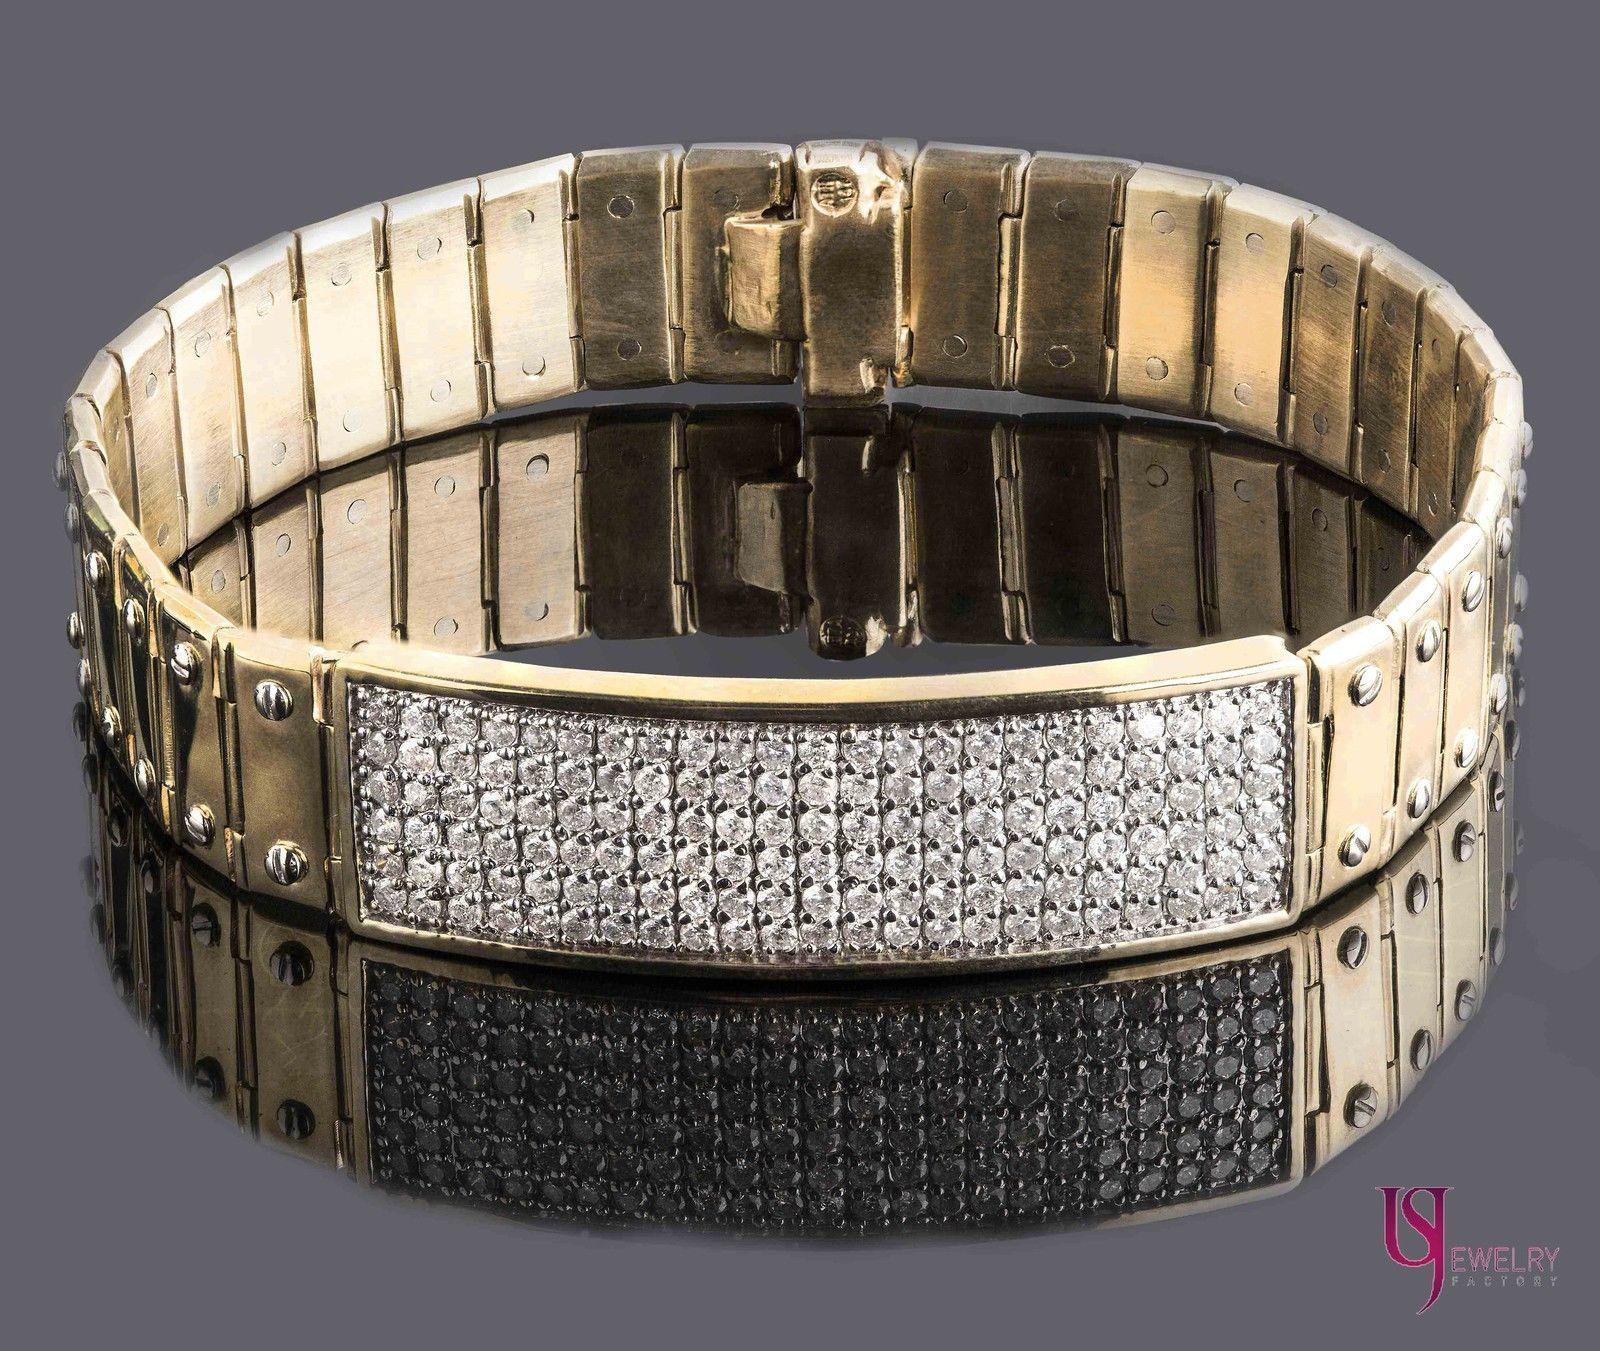 79f346f82 S l1600. S l1600. Previous. 2.90 Ct Men's ID Screw Link Diamond Bracelet  14k Solid Yellow Gold ...